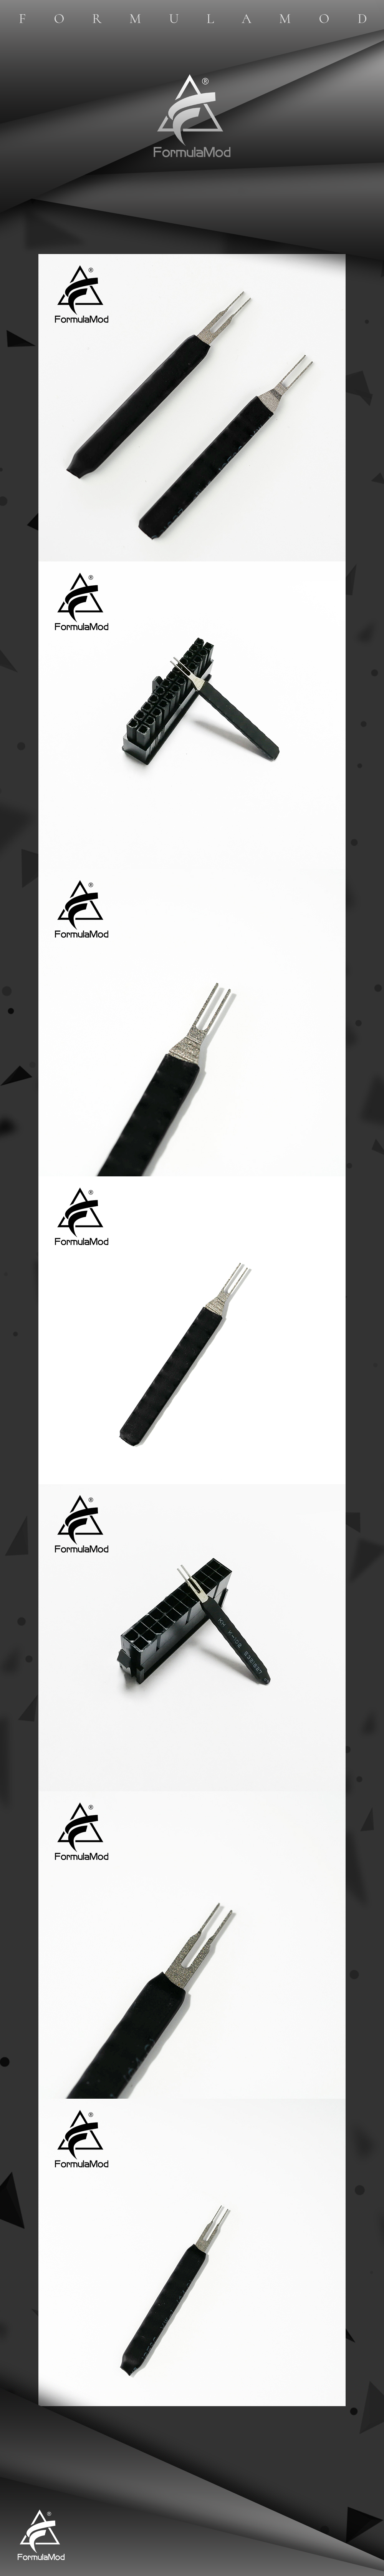 FormulaMod Fm-CXGJ, DIY Extension Cable Tools, For Adjustment/Repair/Reinstallation Extend Cables